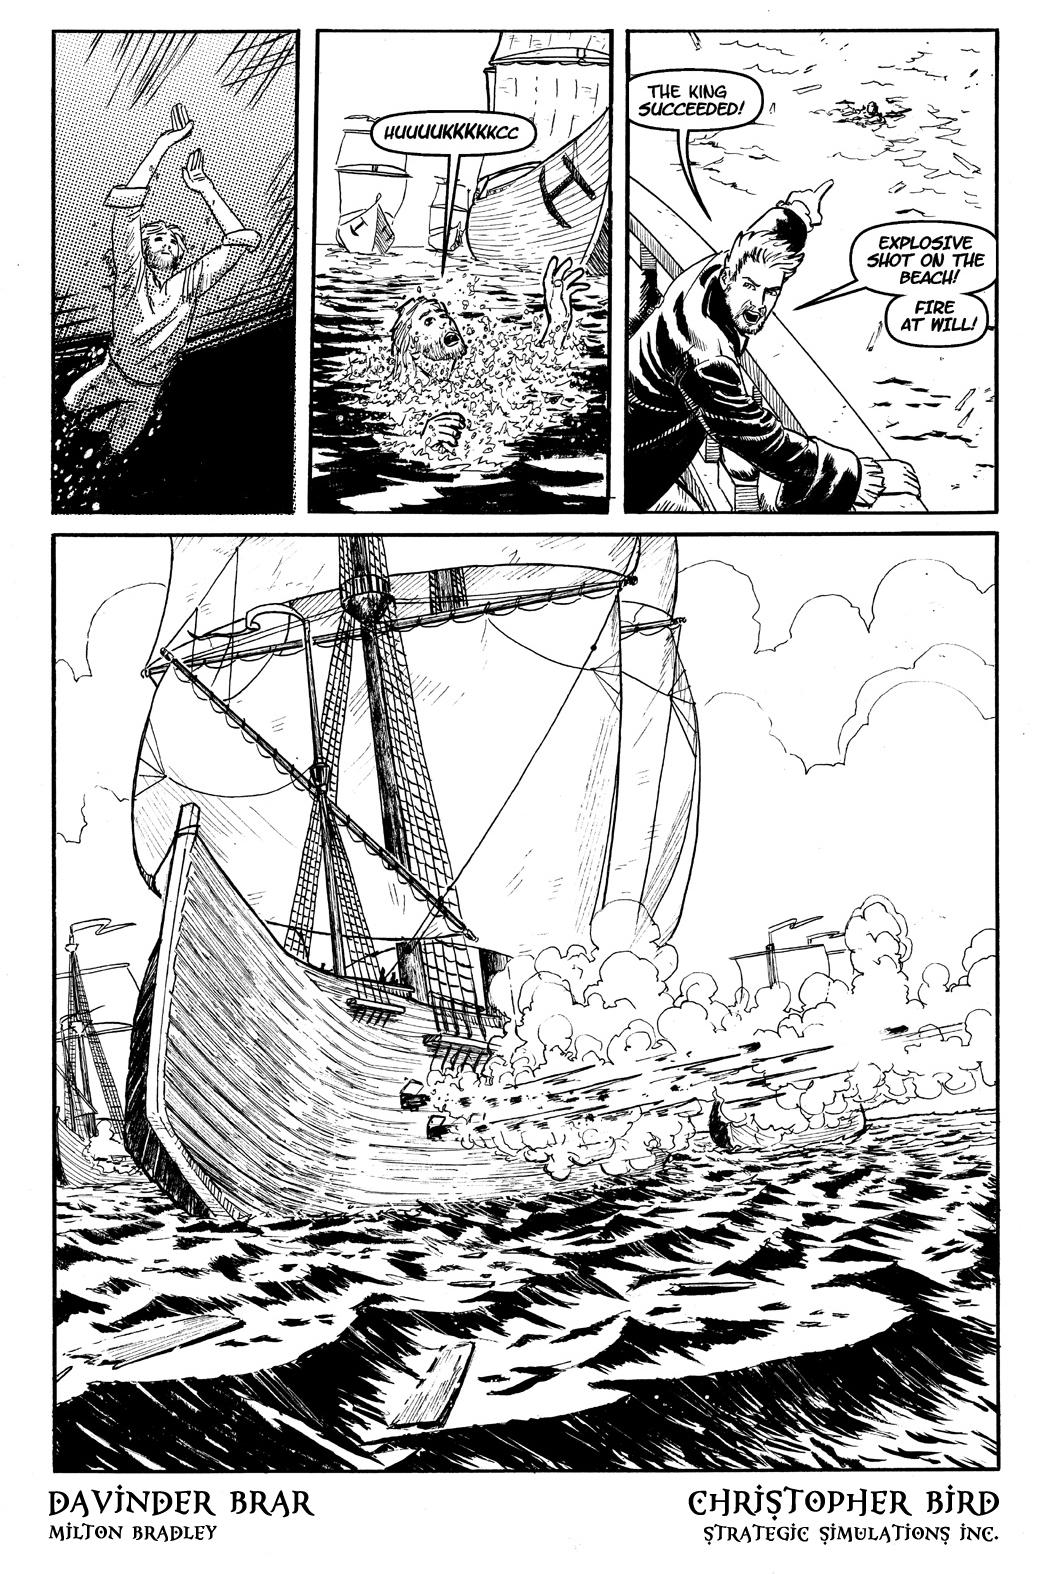 Book Eight, Page Twenty-Nine